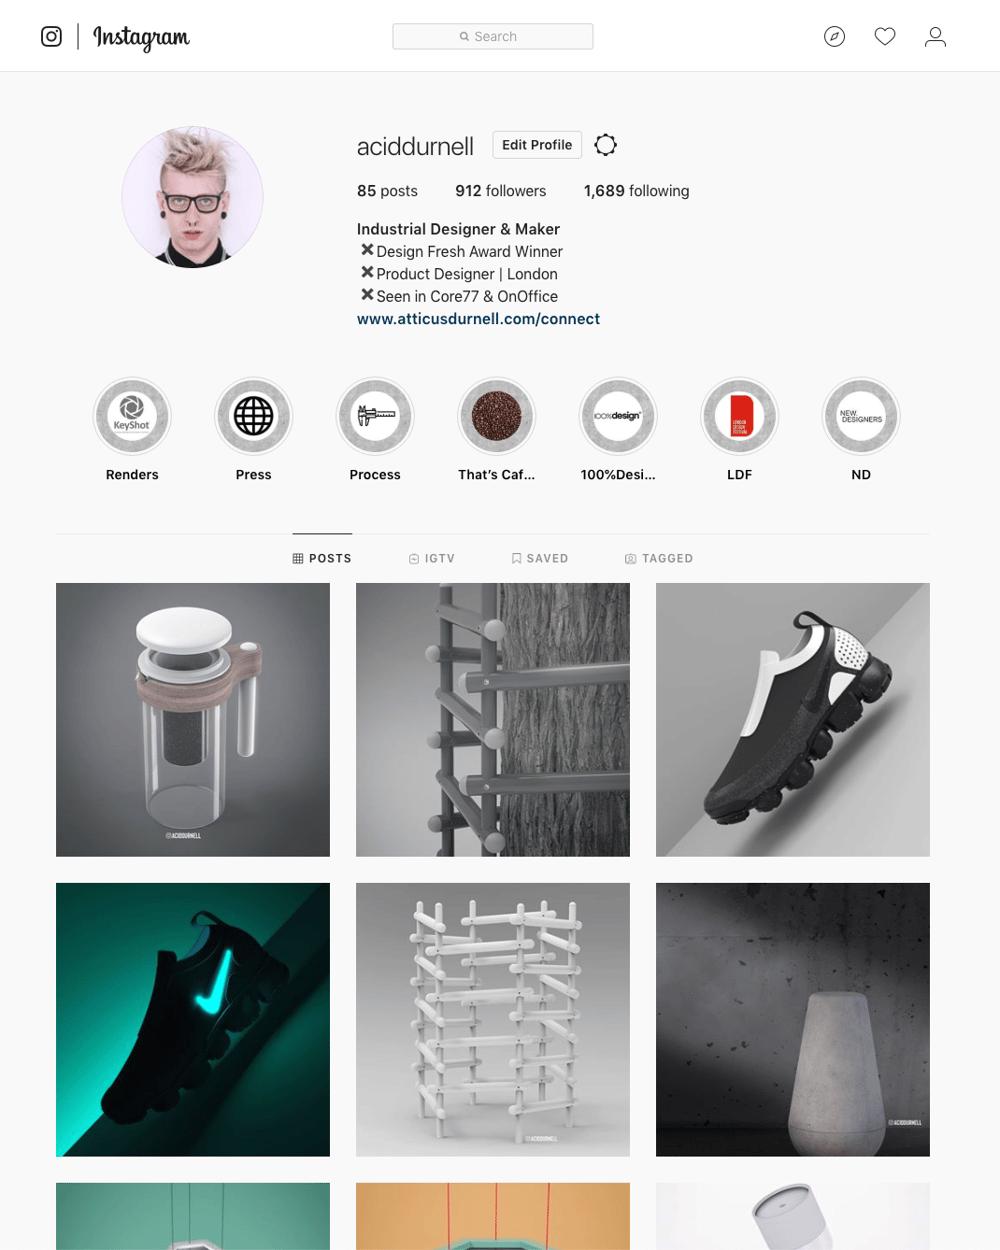 Industrial Designer IG - image 1 - student project